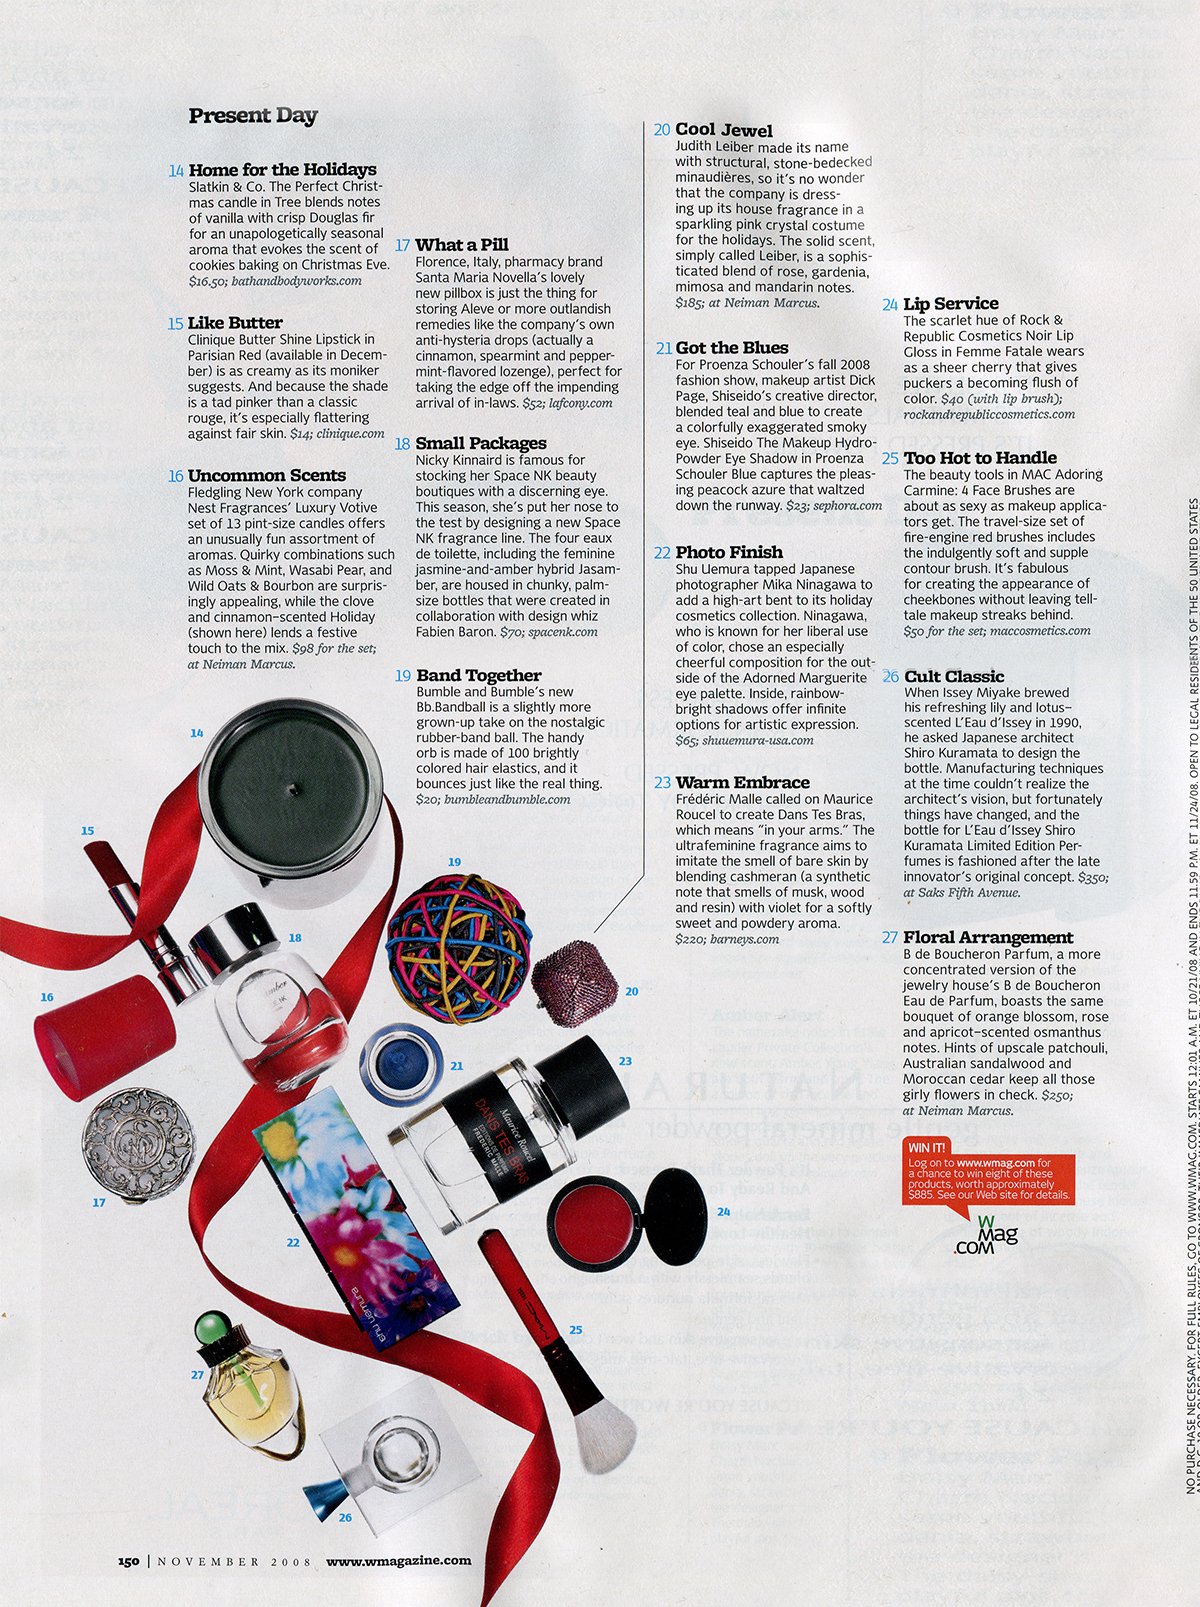 W Magazine November 2008